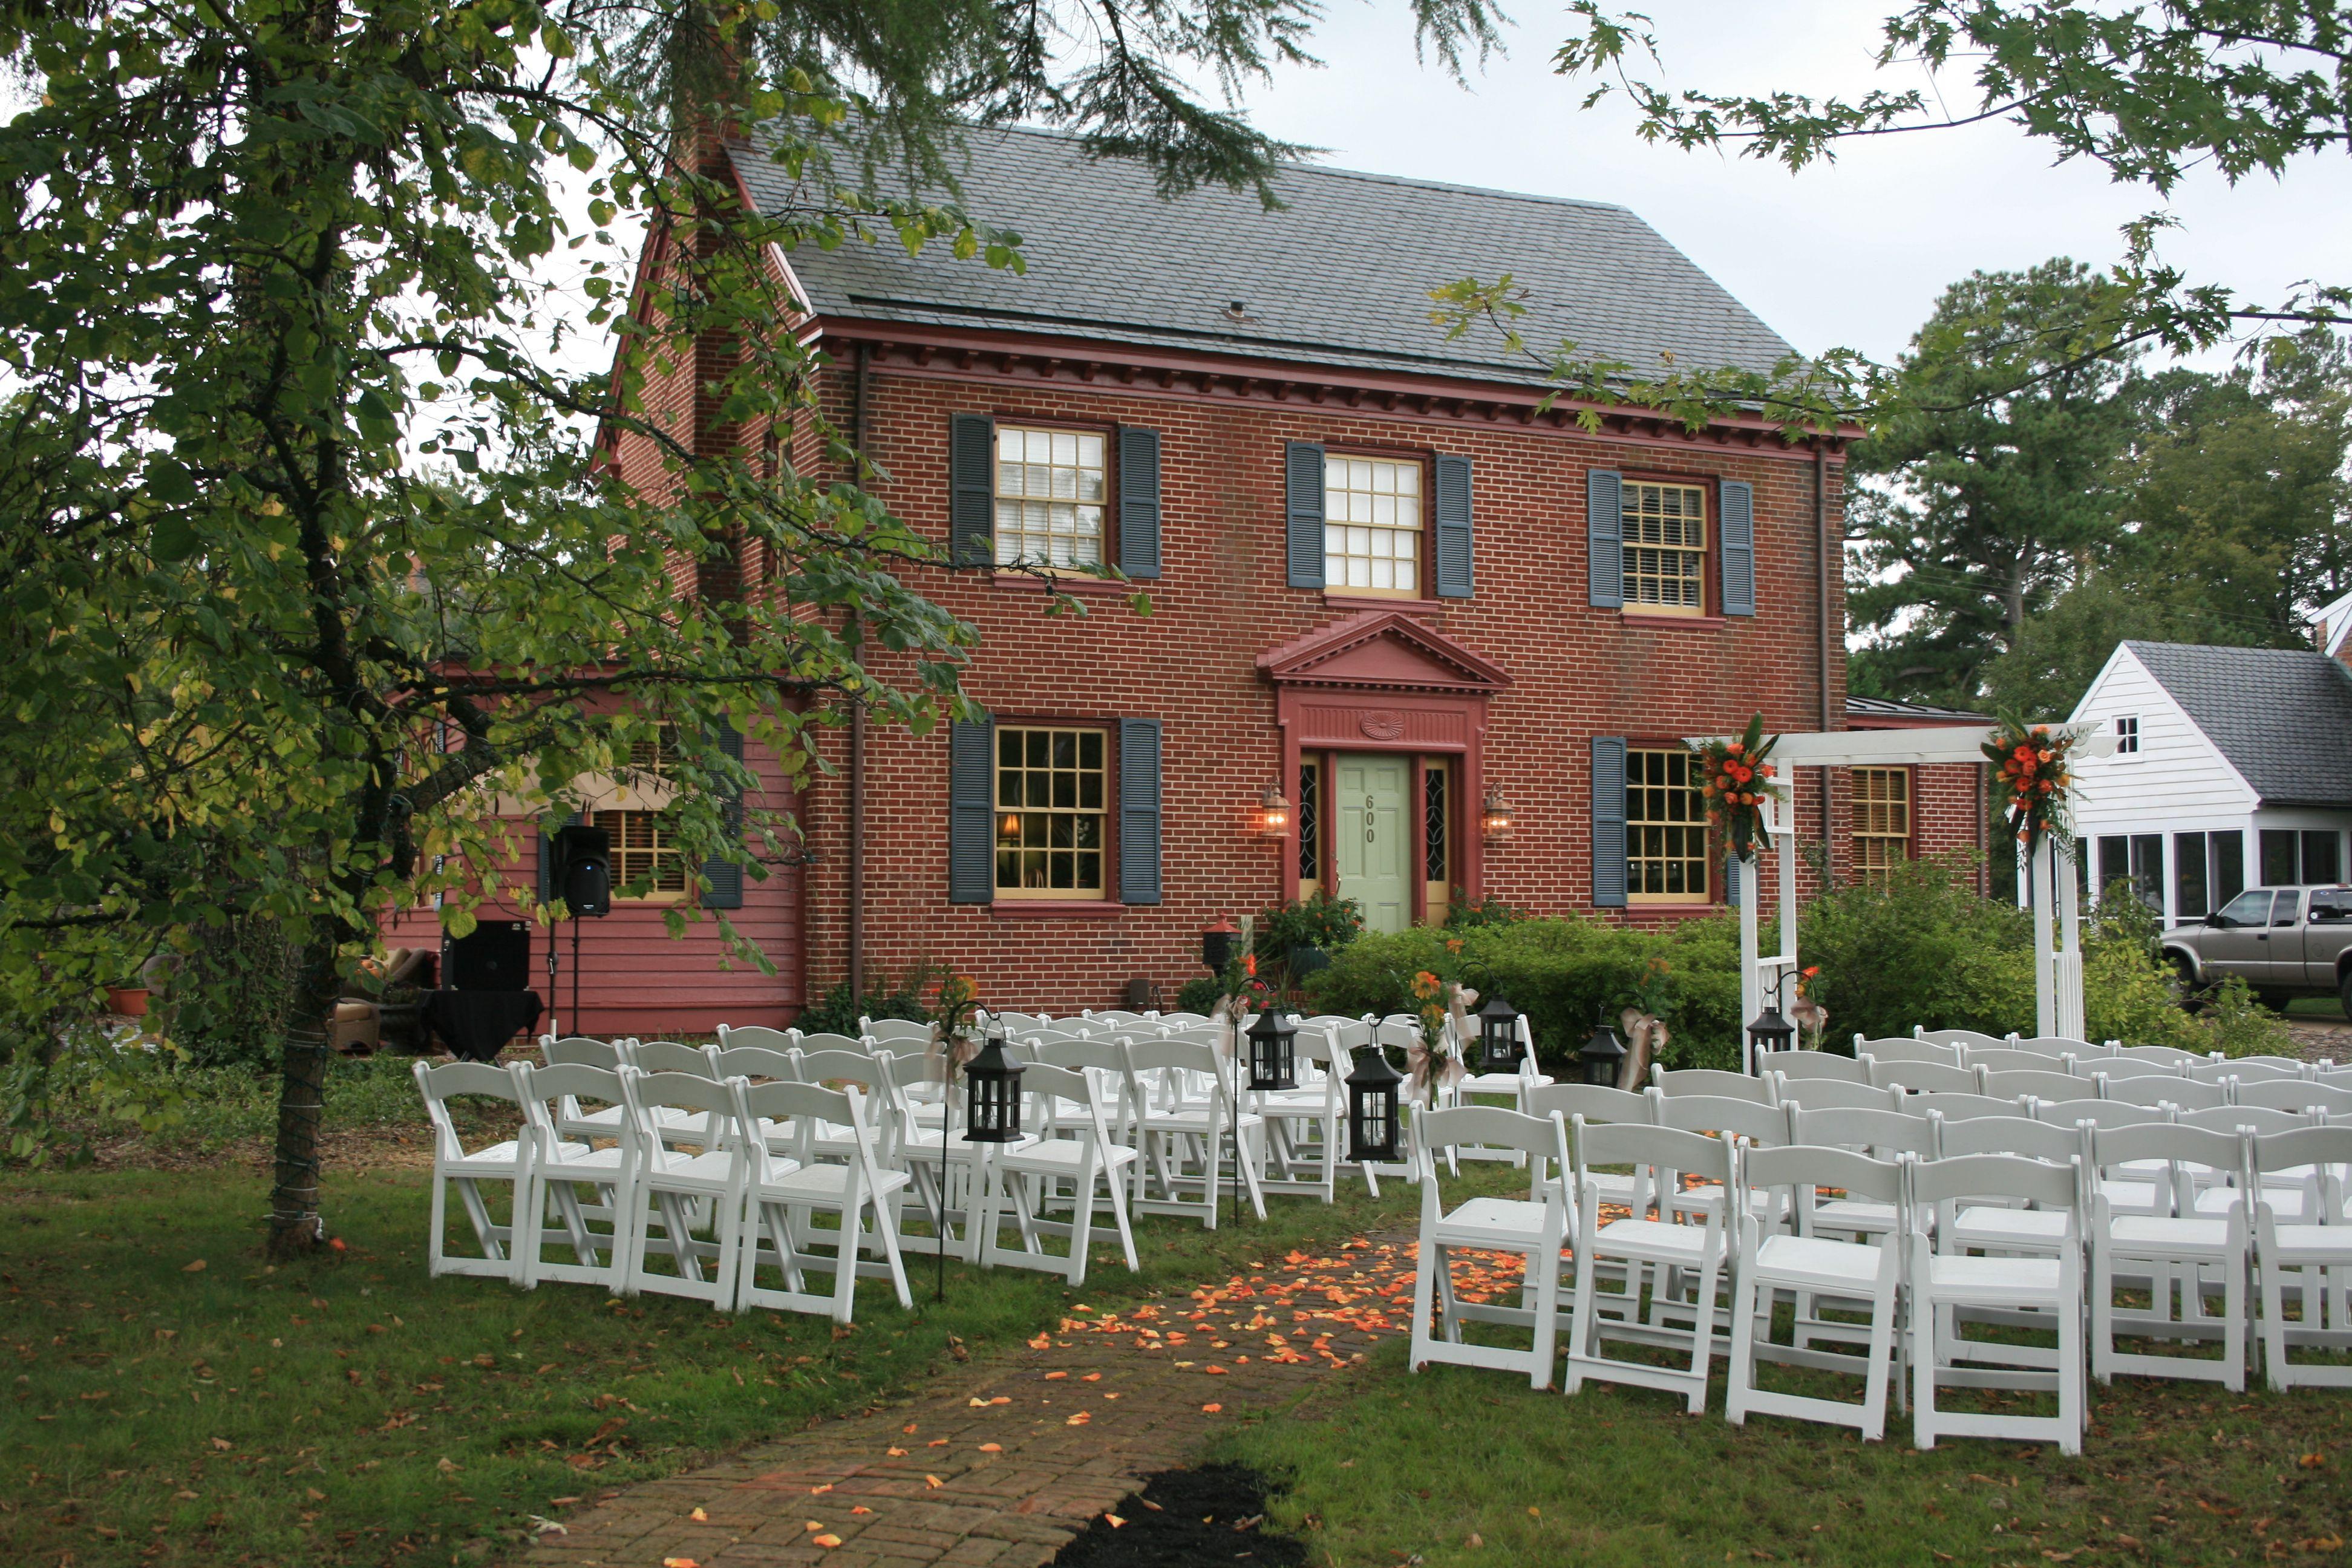 williamsburg manor bed & breakfast williamsburg wedding venue www